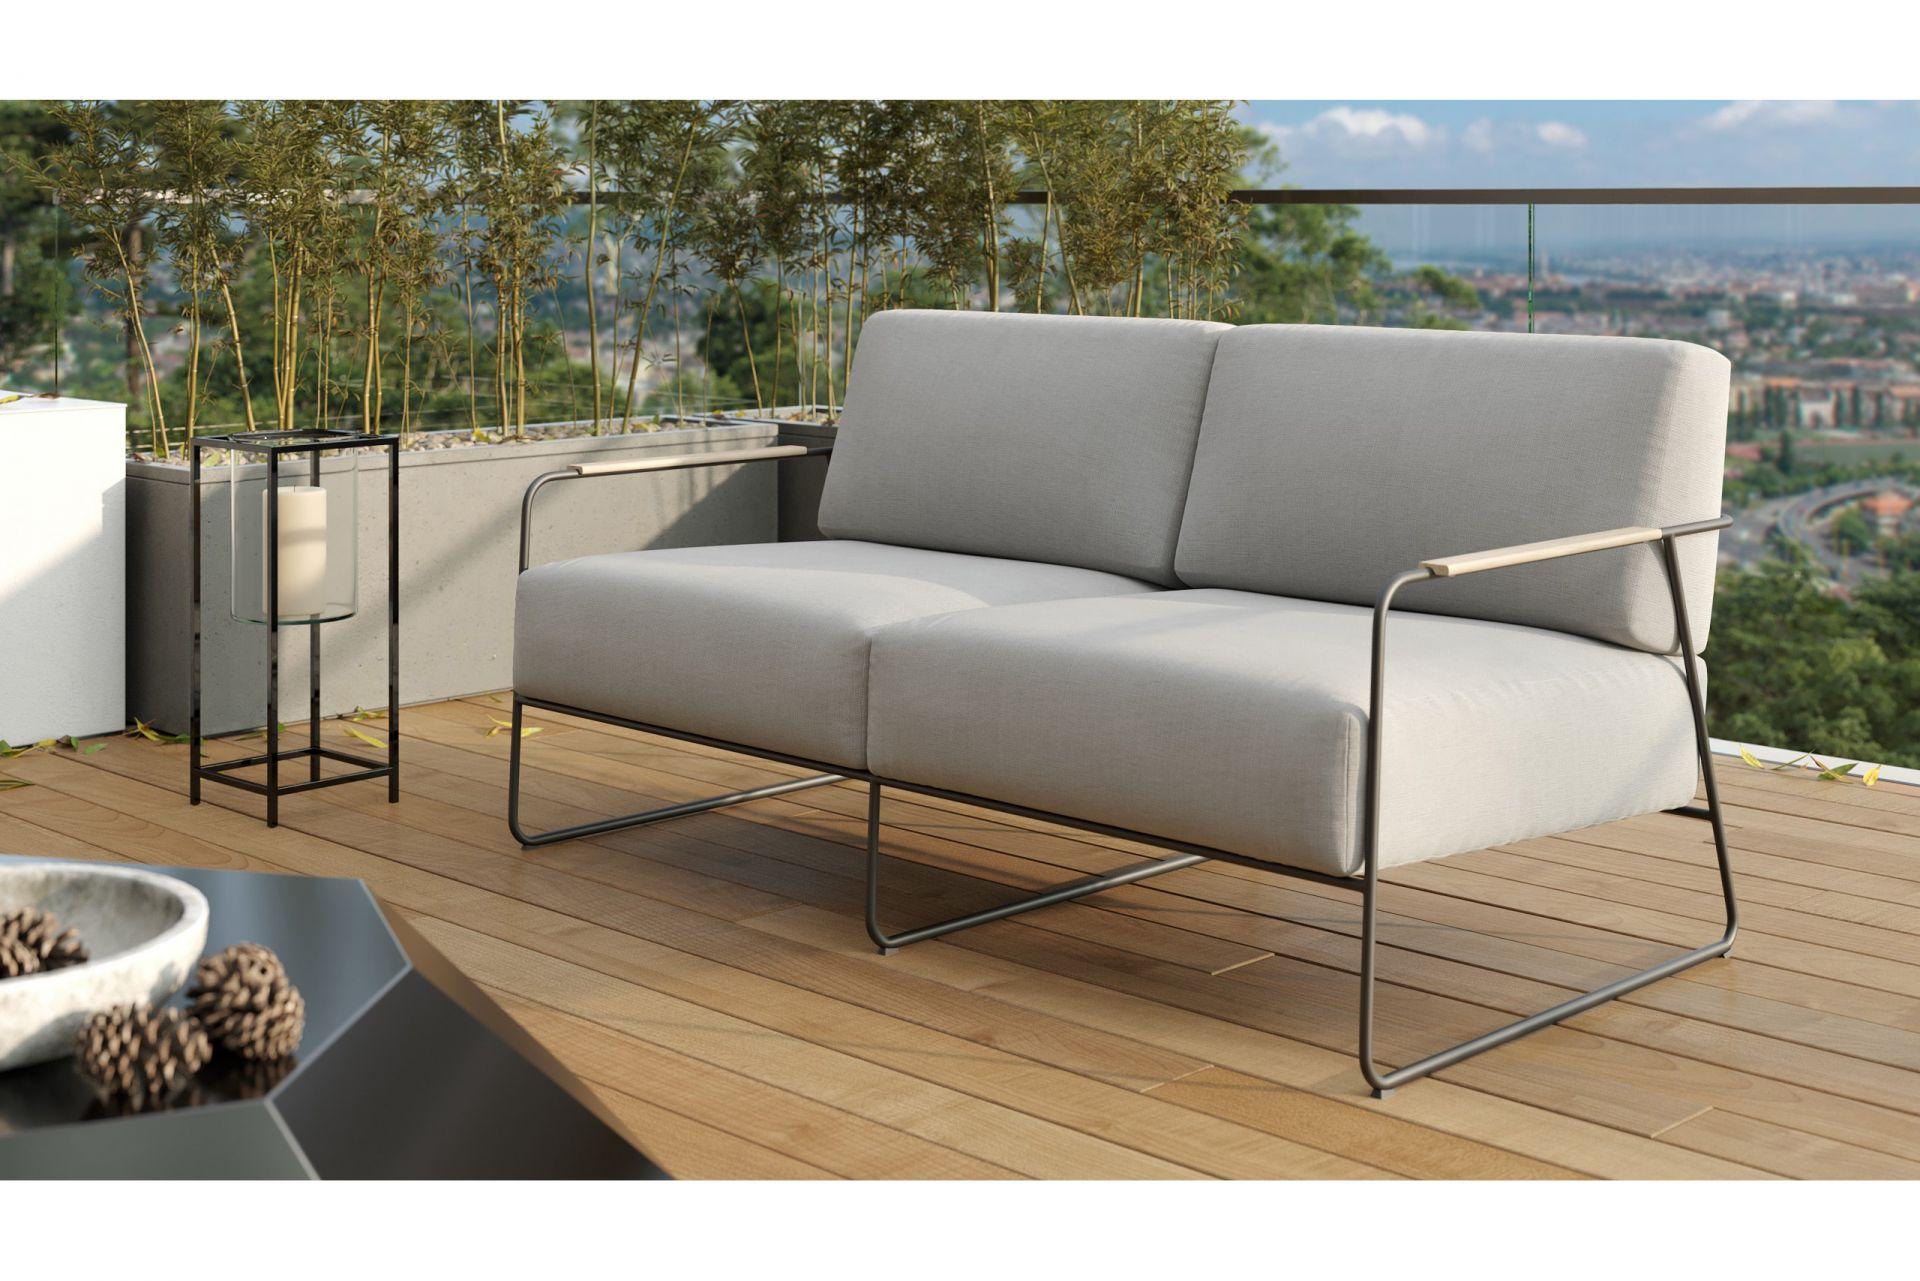 VALENCIA Lounge Set